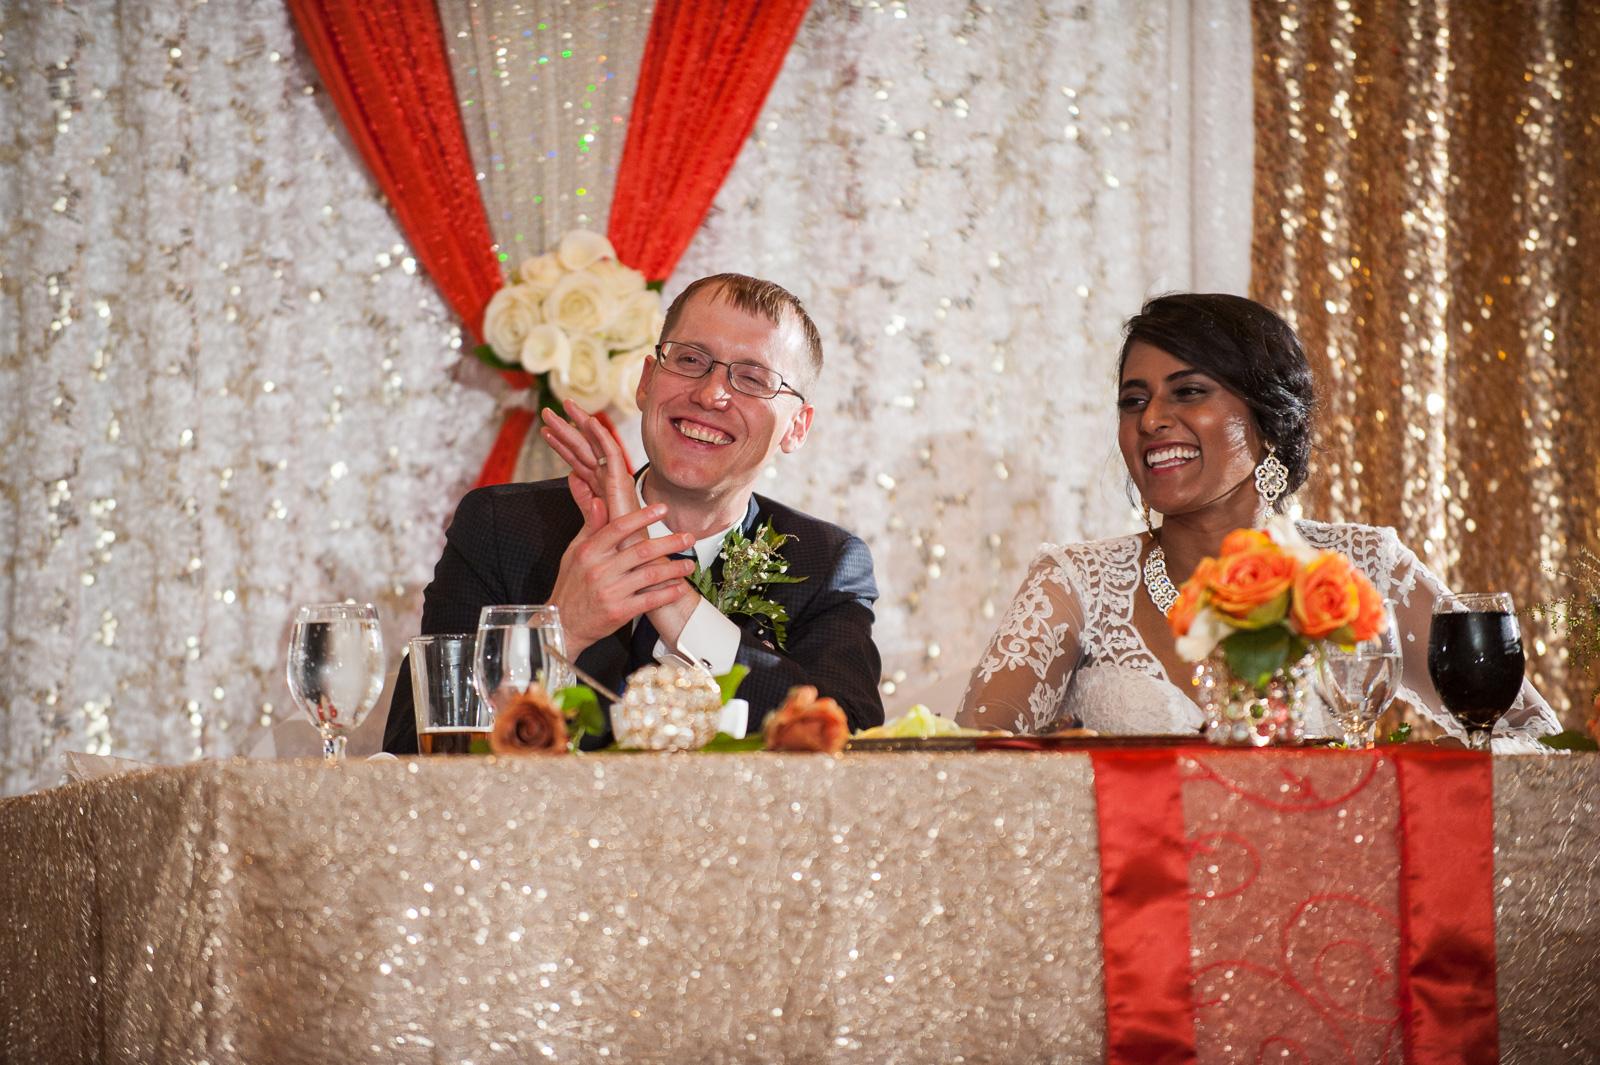 bc-wedding-photographers-paradise-banquet-hall-wedding-32.jpg